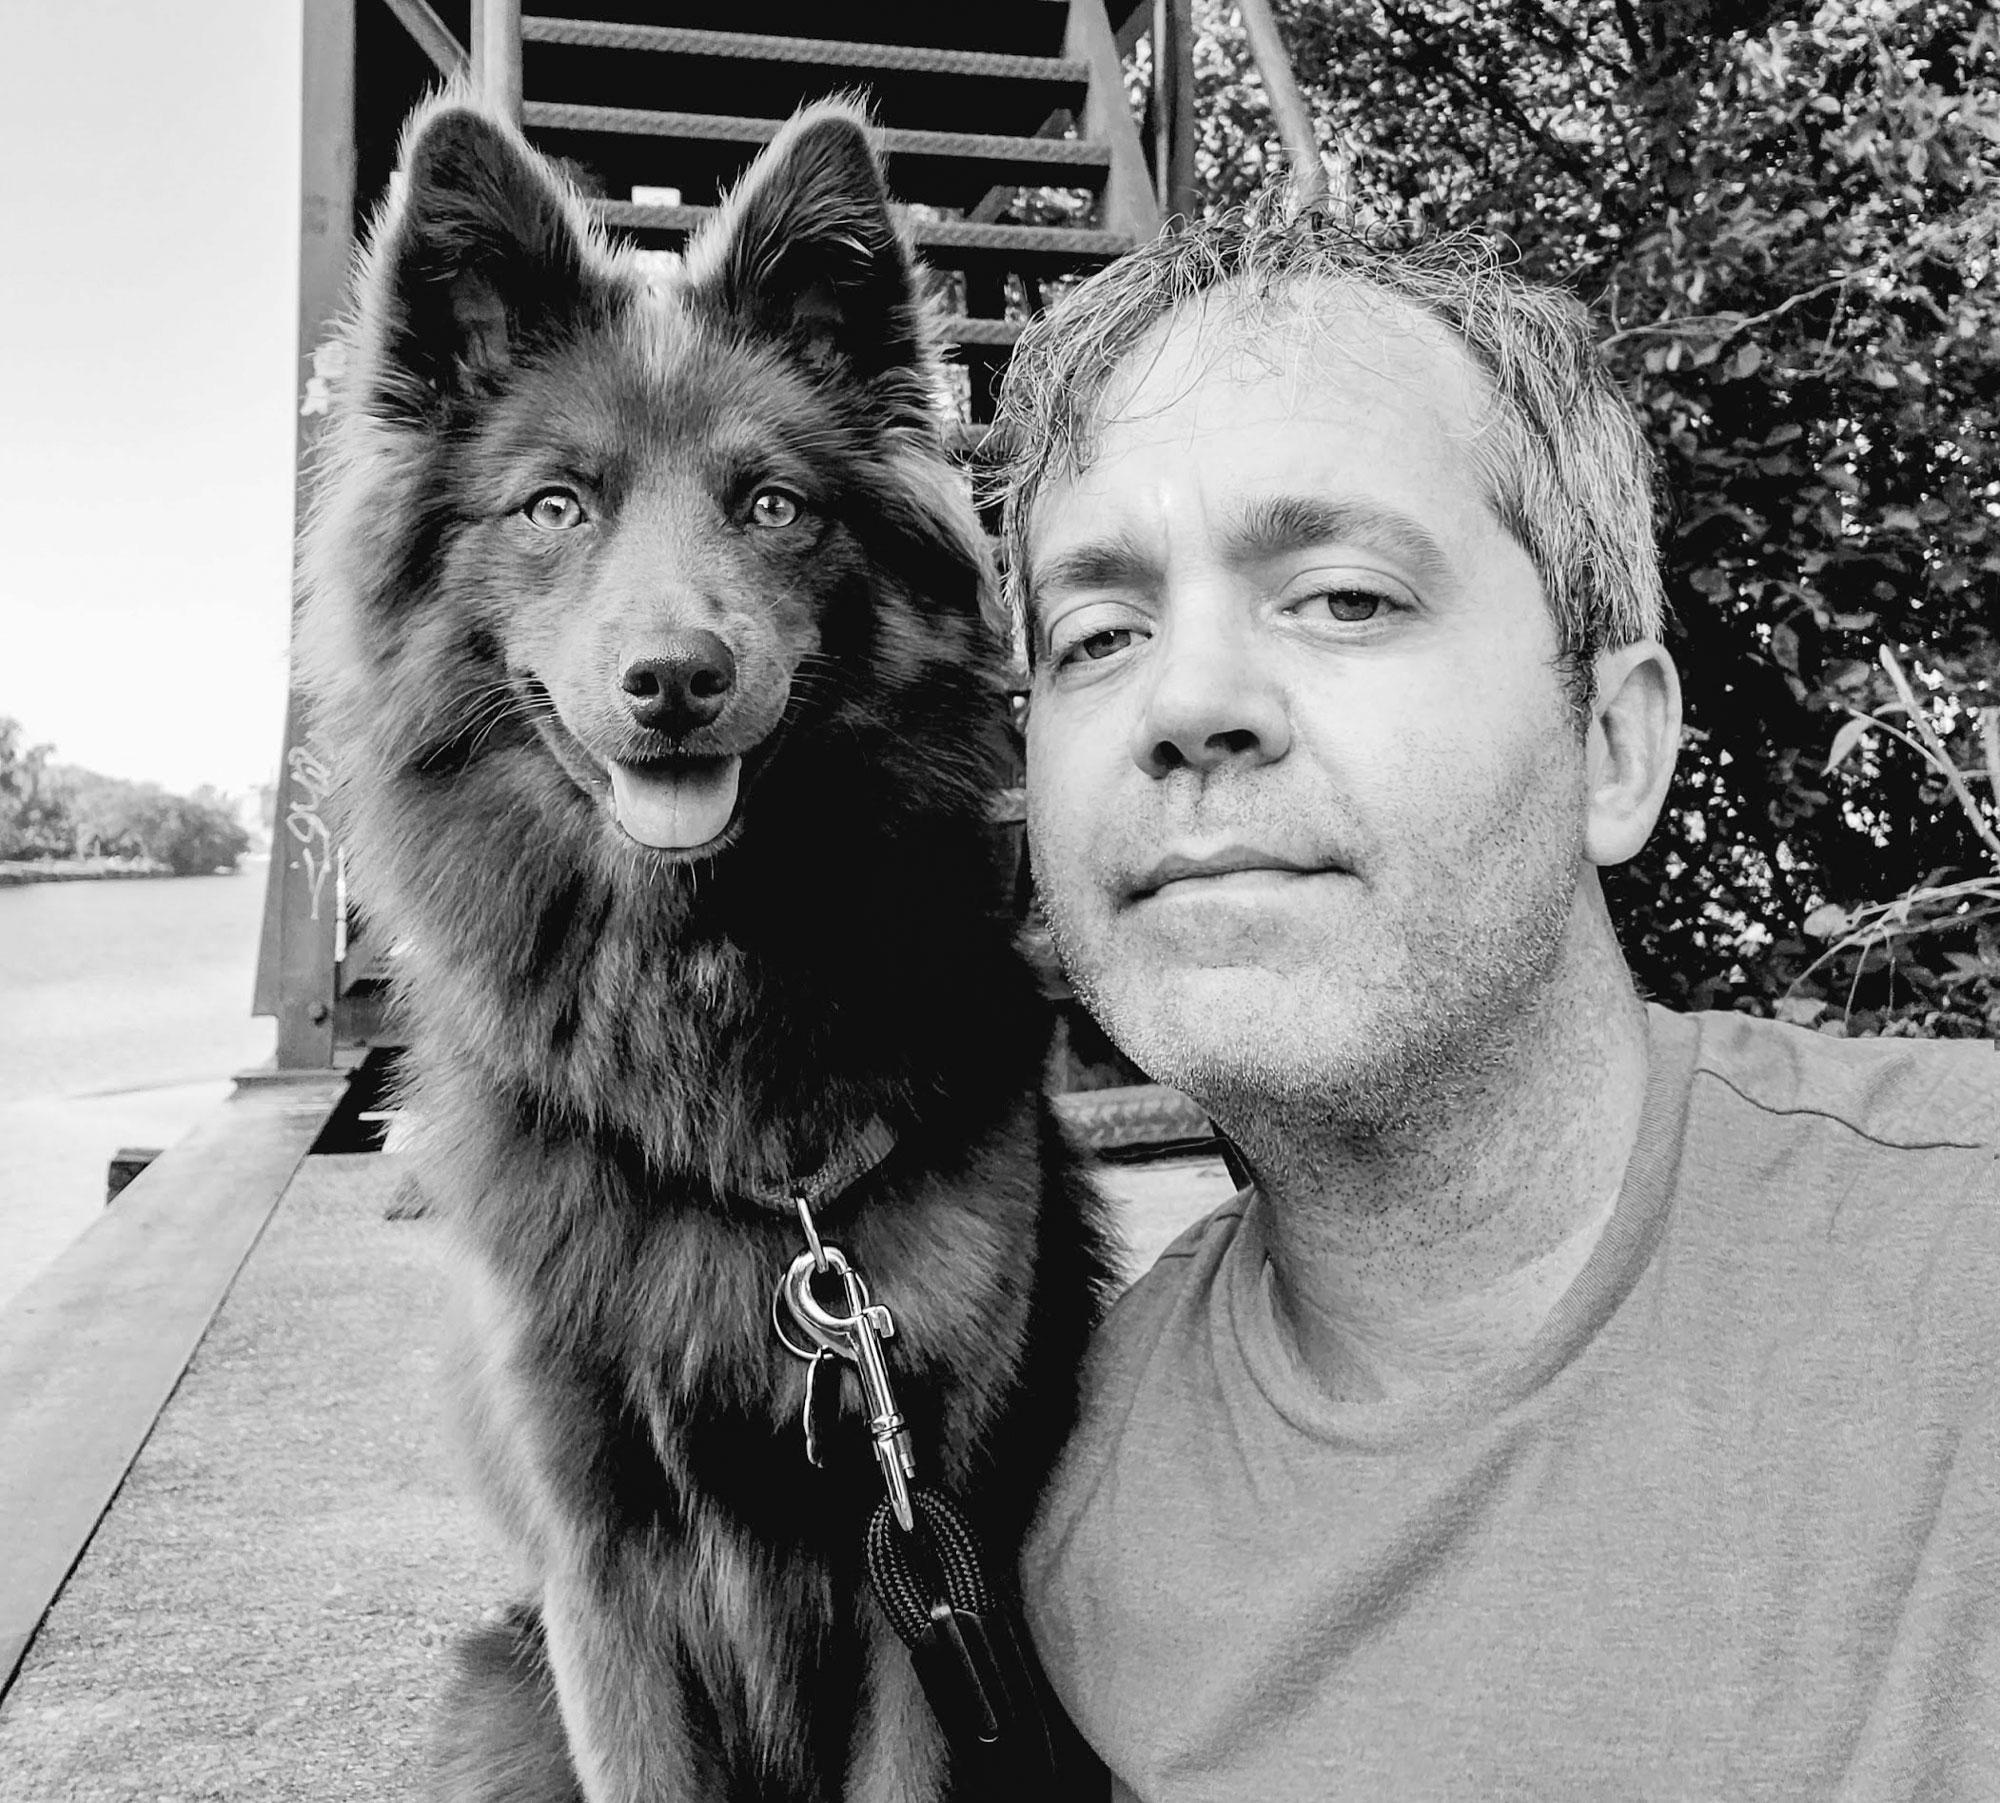 A selfie of me and Hazel dog.